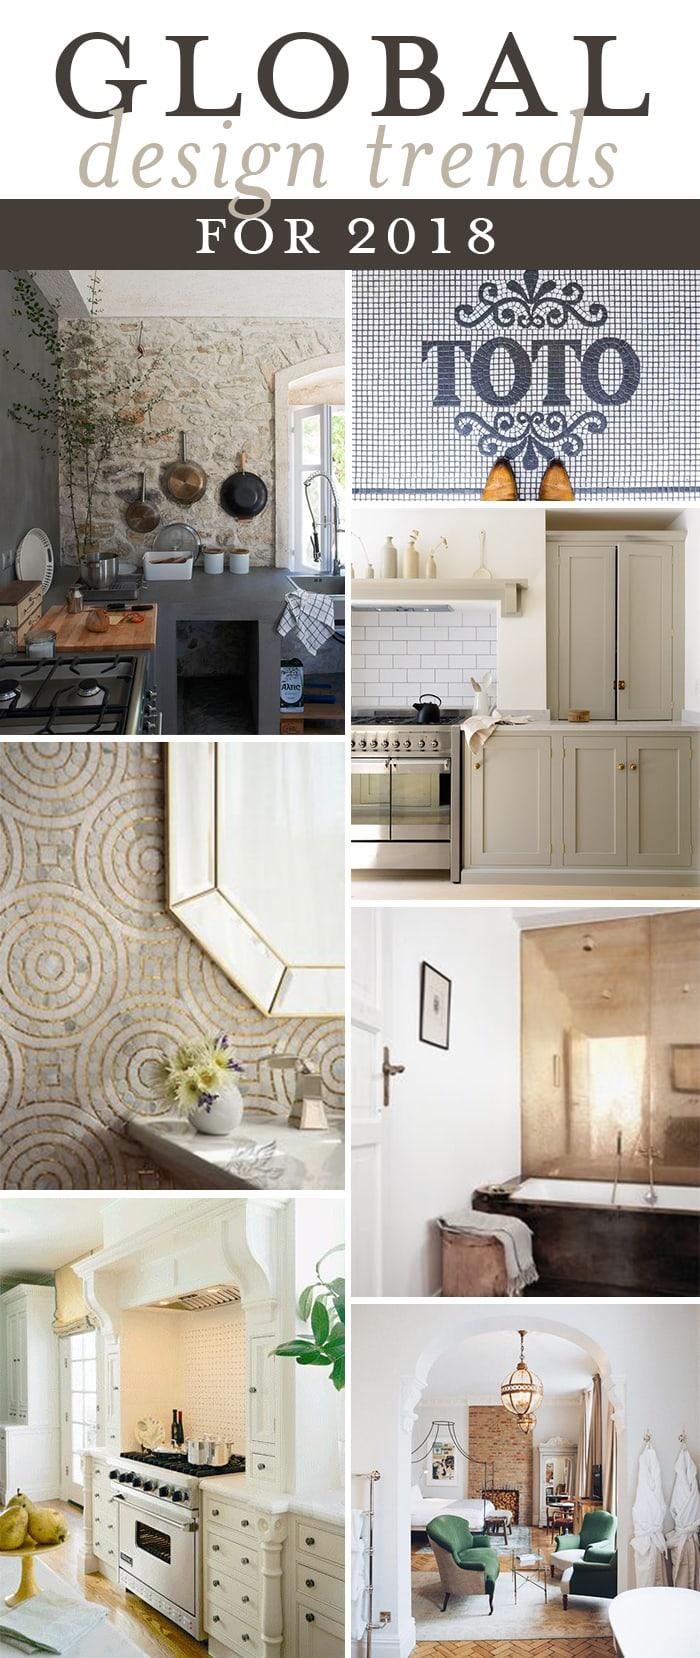 Swell My Top 10 Design Trends For 2018 Jenna Sue Design Blog Download Free Architecture Designs Scobabritishbridgeorg